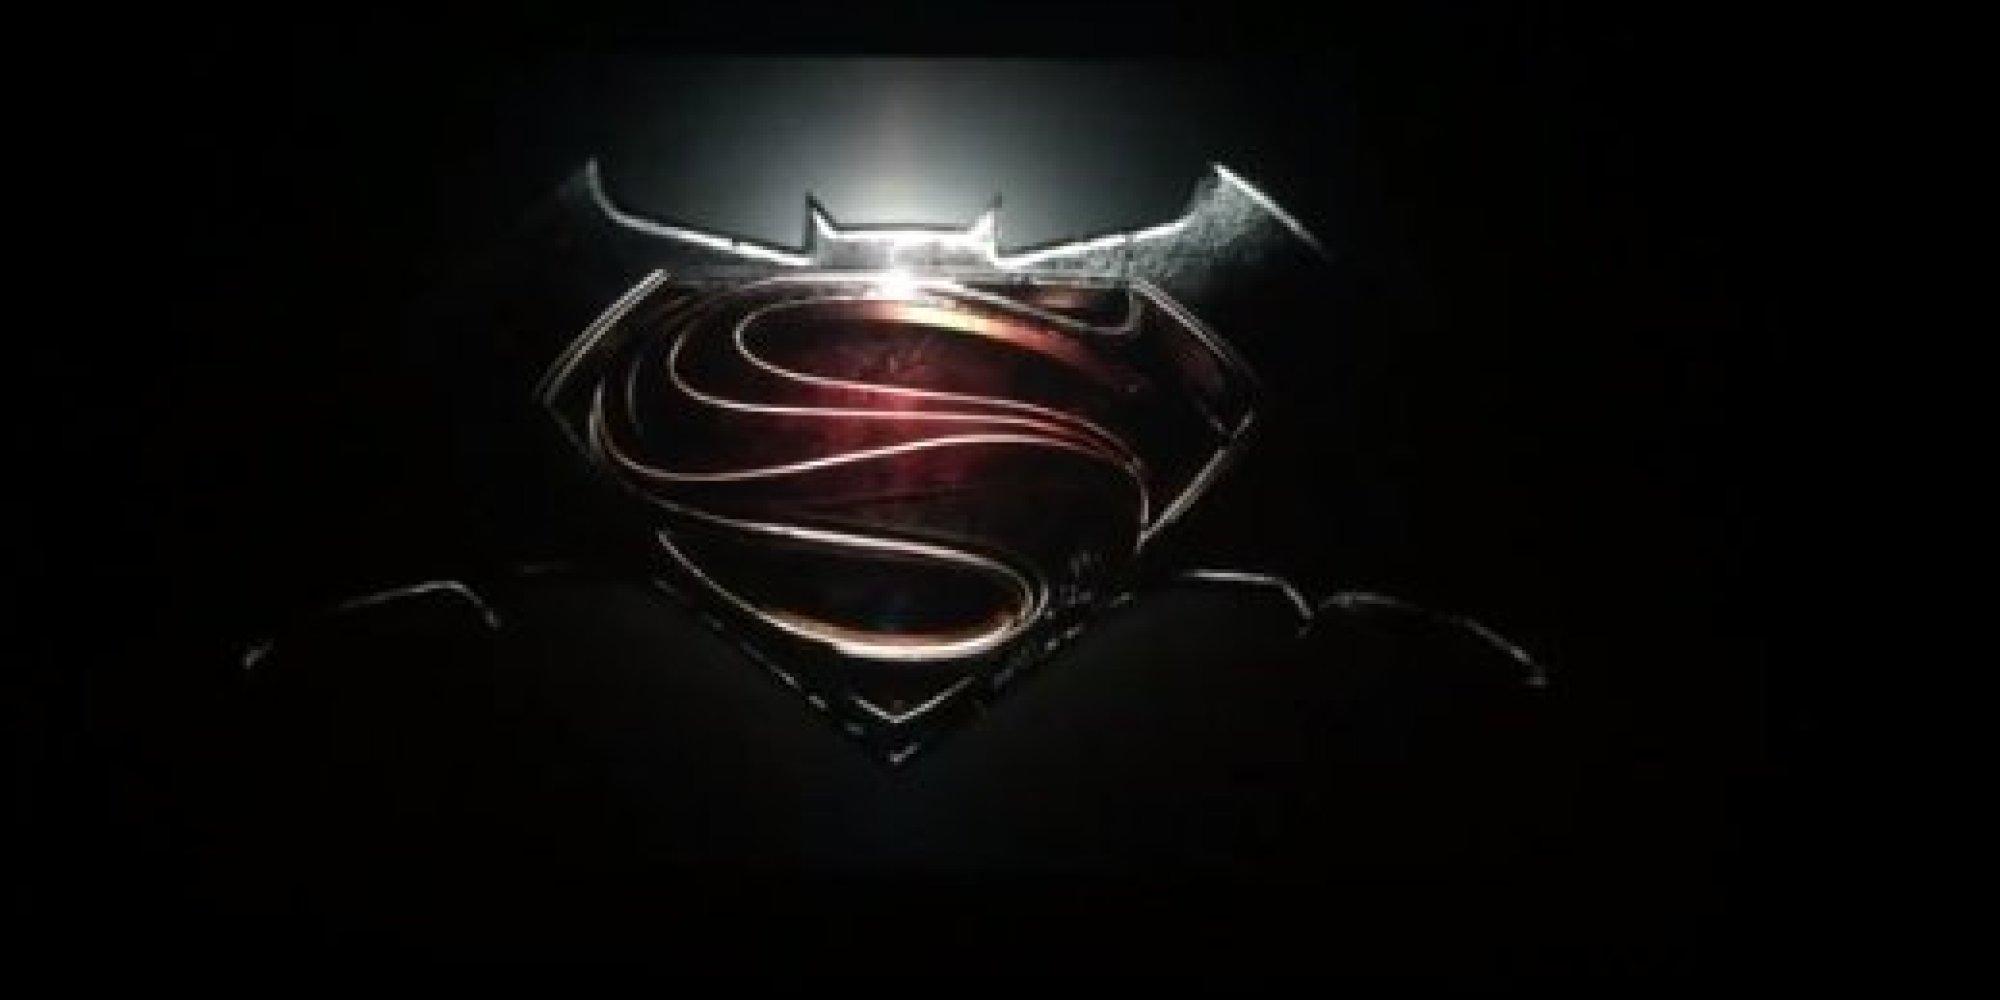 The First Batman V Superman Trailer Leaks Online